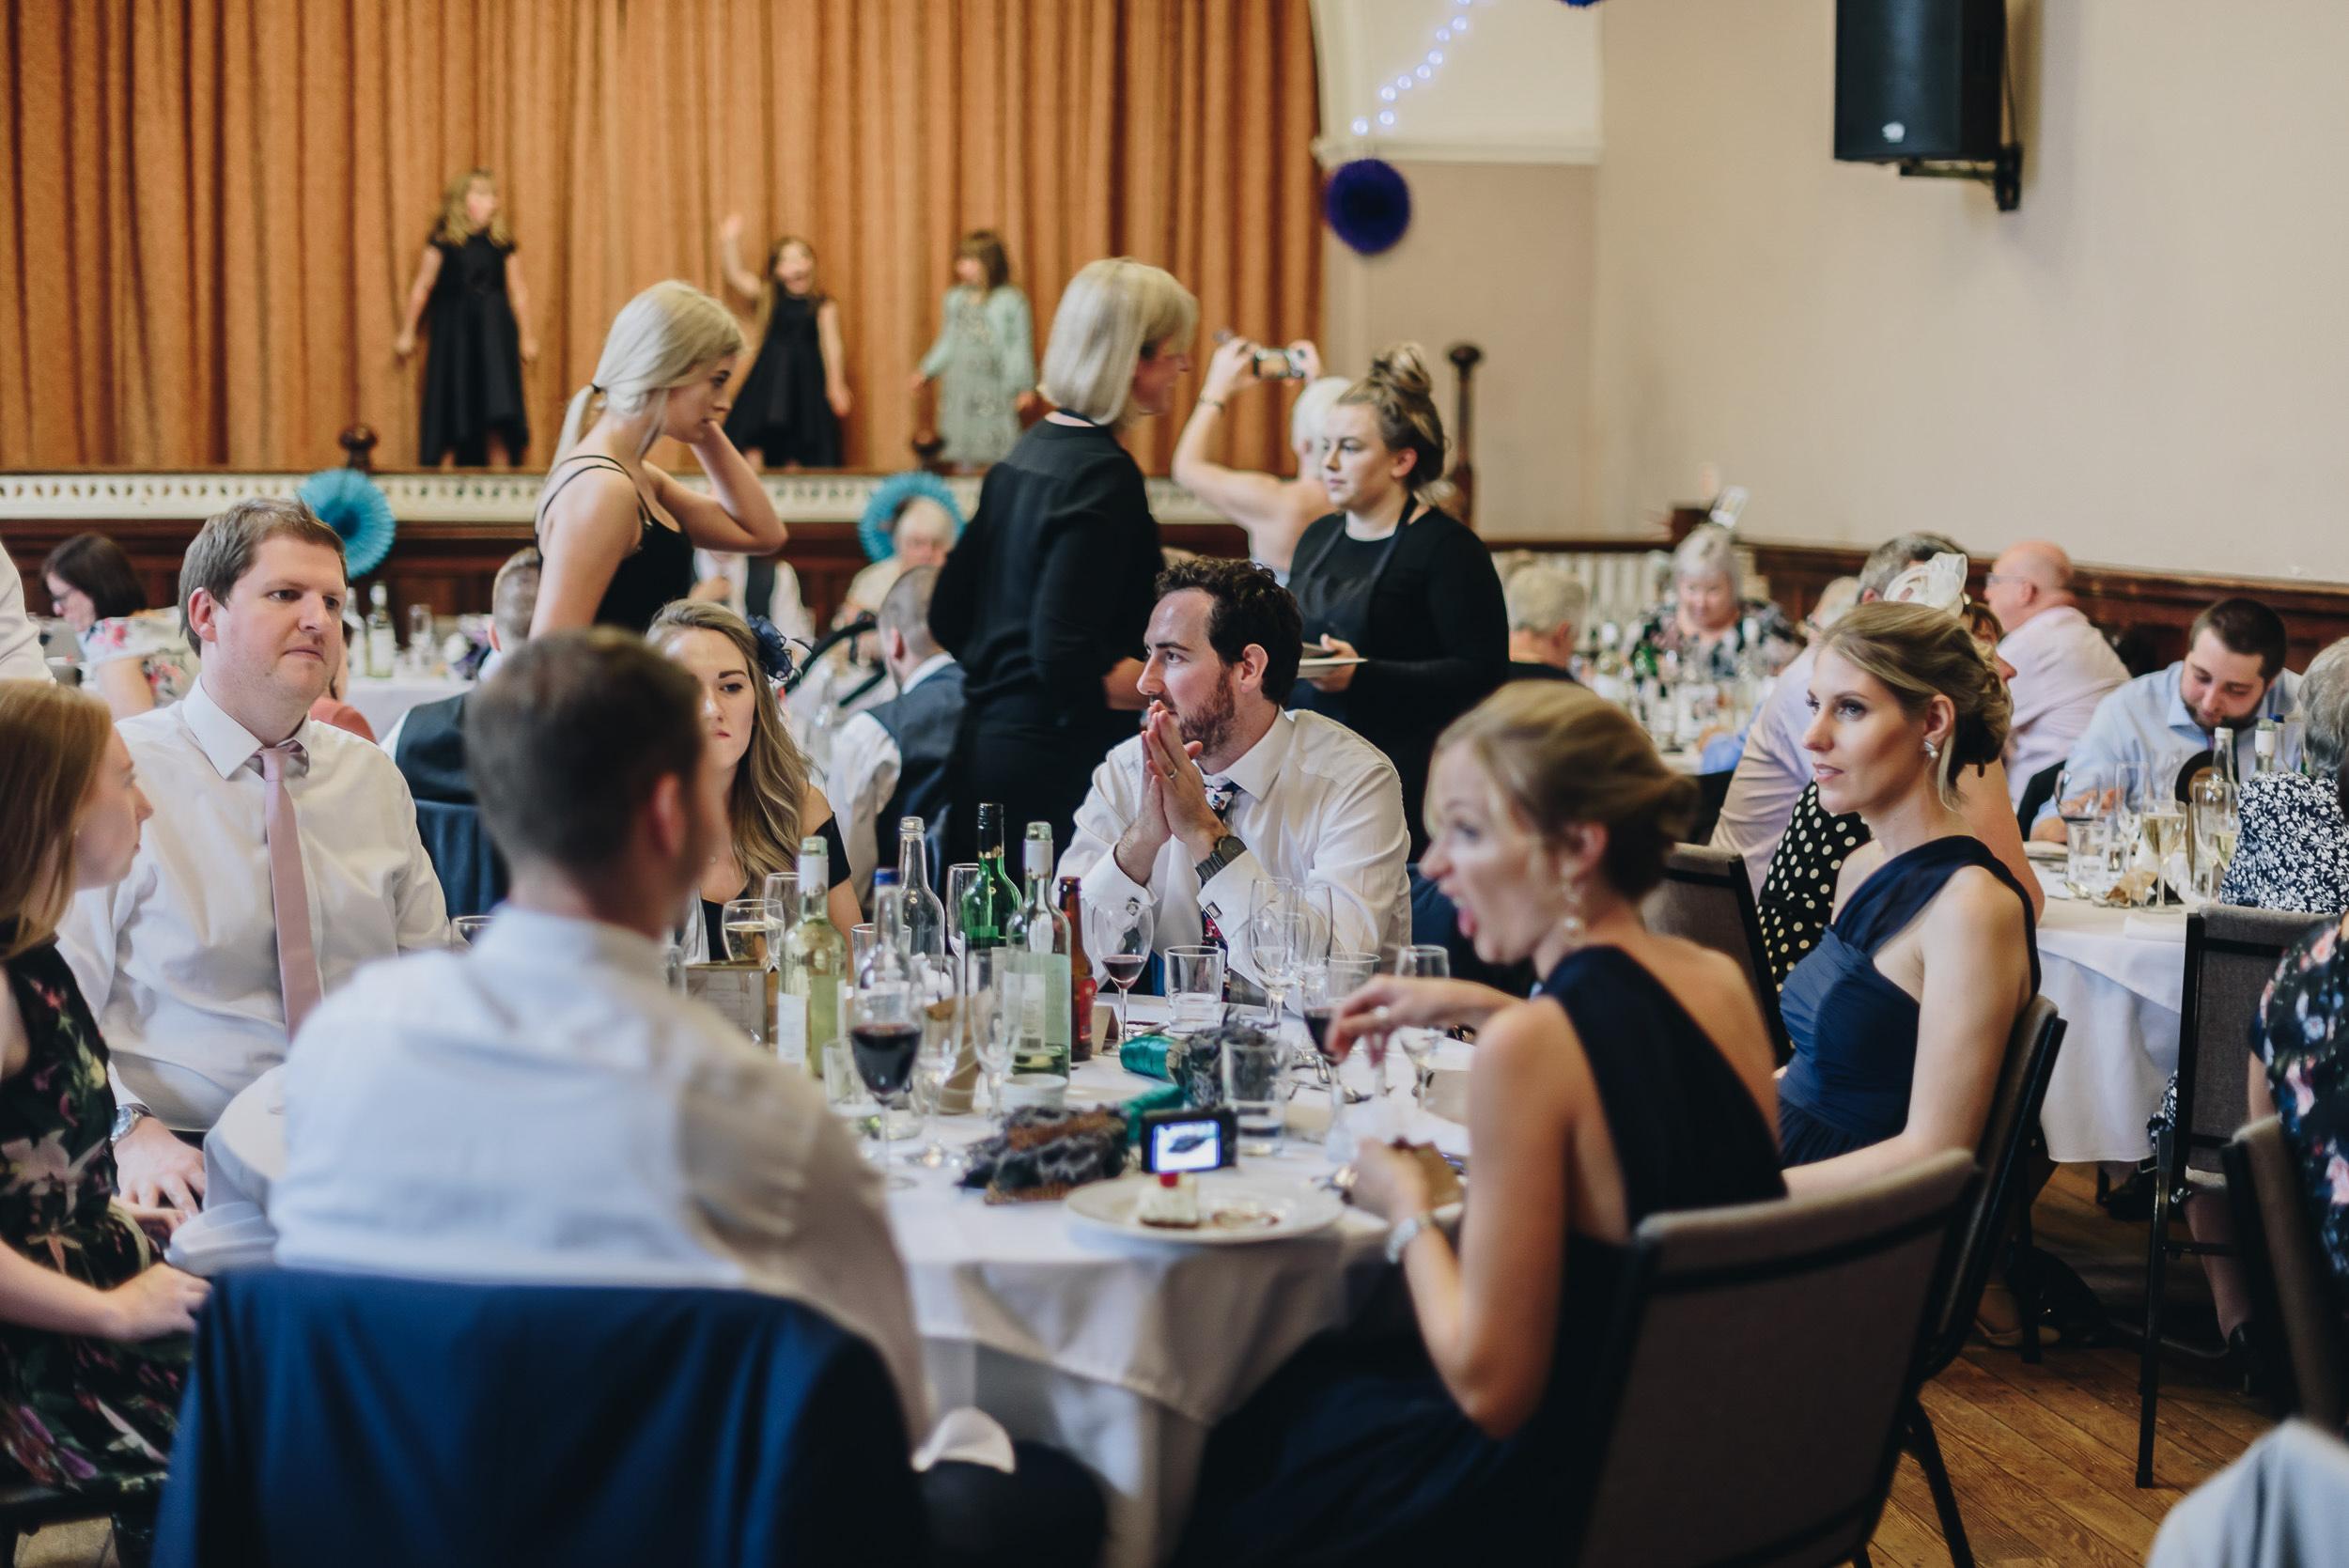 Smithills-hall-wedding-manchester-the-barlow-edgworth-hadfield-91.jpg